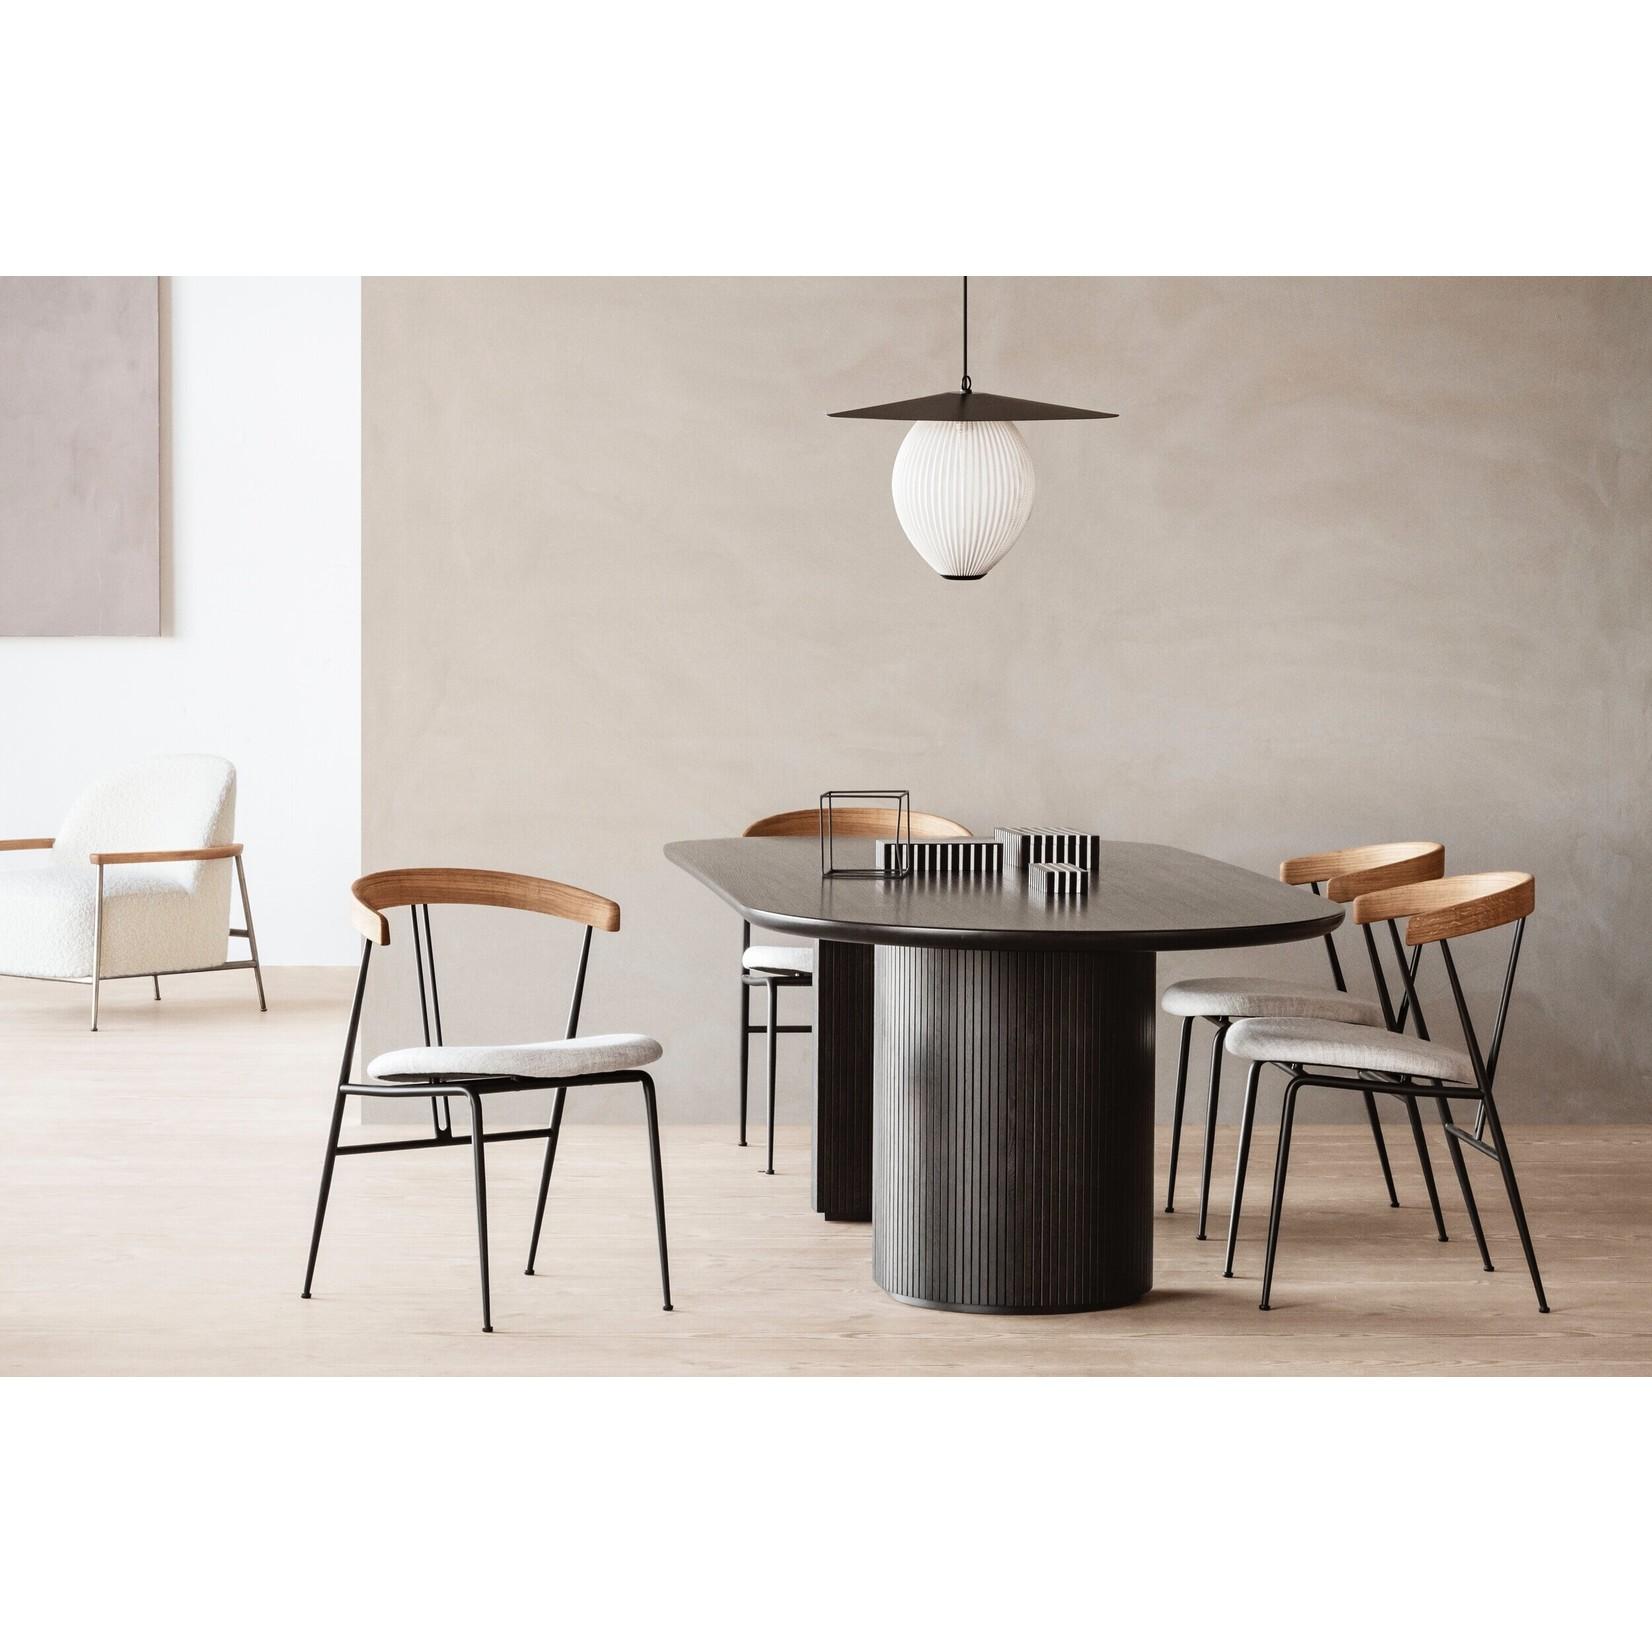 Gubi Moon Dining Table - Elliptical 300x105